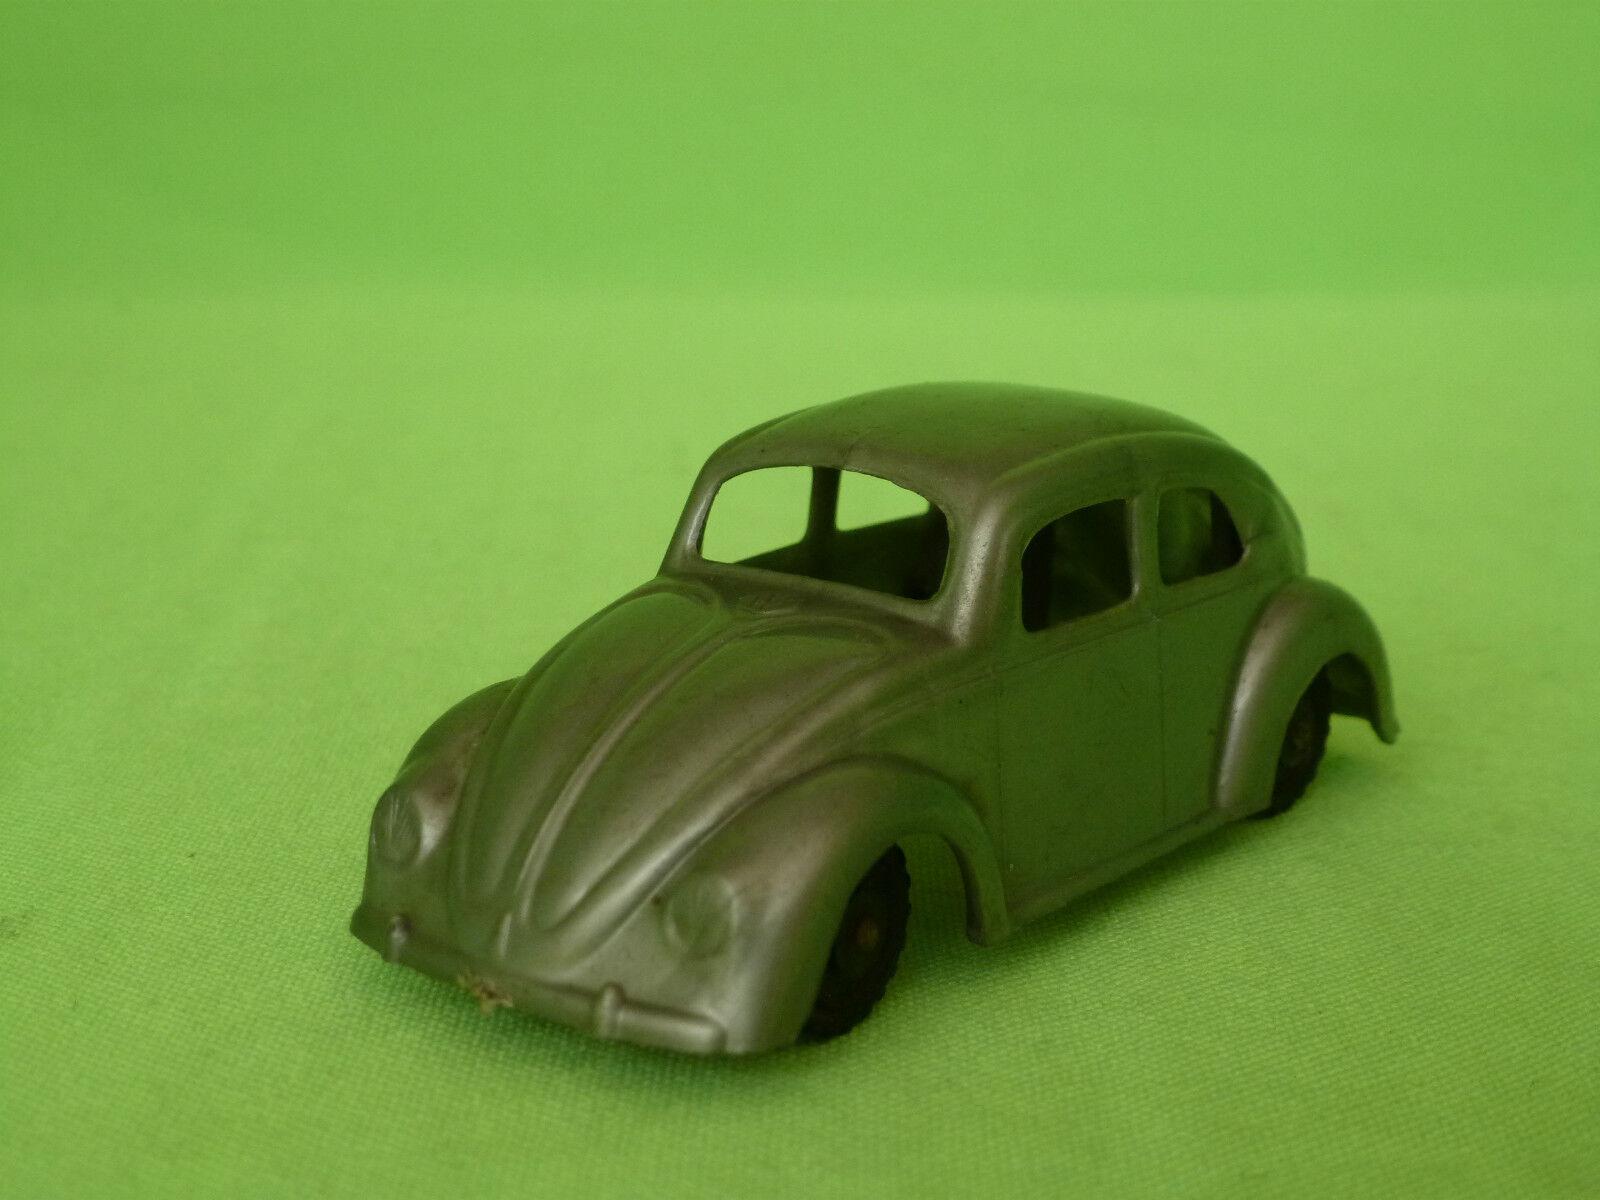 KAEFER BEETLE   VW VOLKSWAGEN  1 45   EXTREMELY RARE  1950